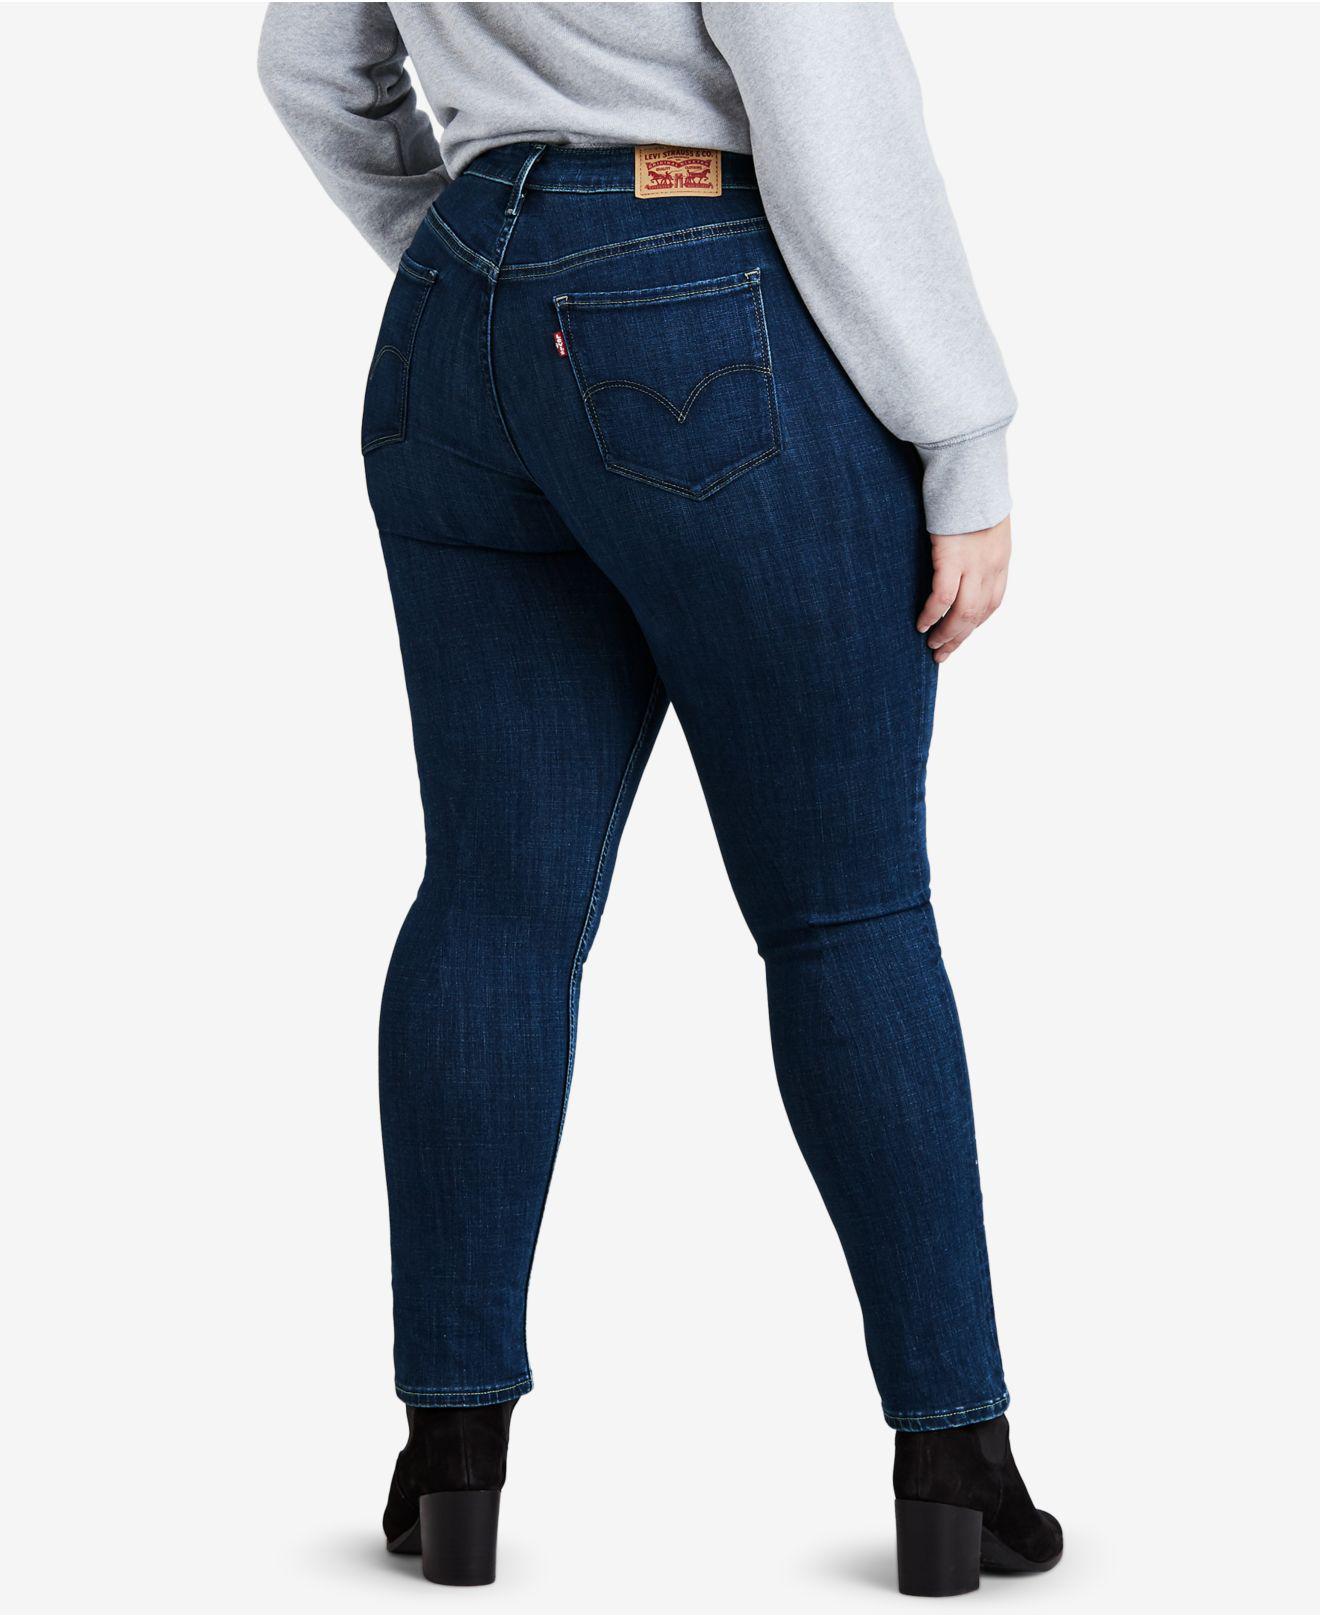 adb6c4b8f44 Lyst - Levi S ® Plus Size 711 Studded Stretch Skinny Jeans in Blue